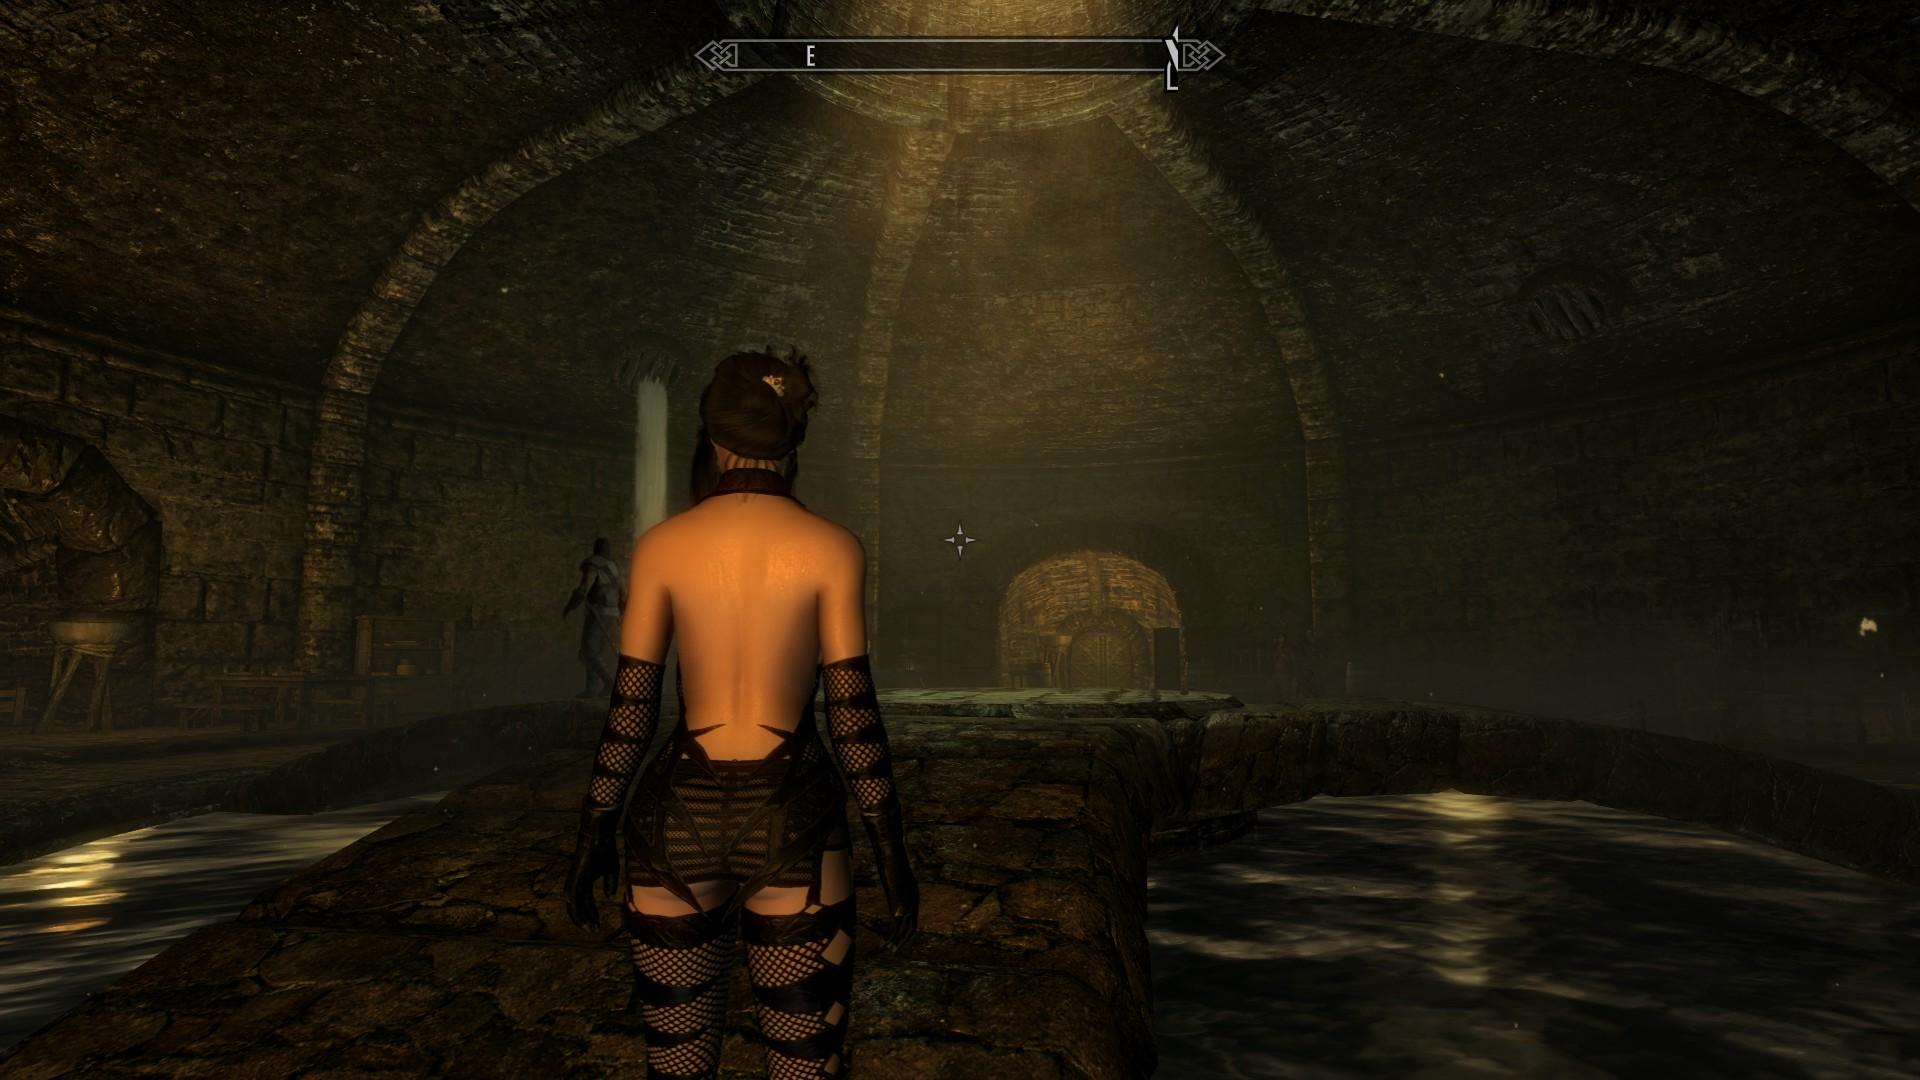 TÓPICO OFICIAL] - The Elder Scrolls V: Skyrim   Page 205